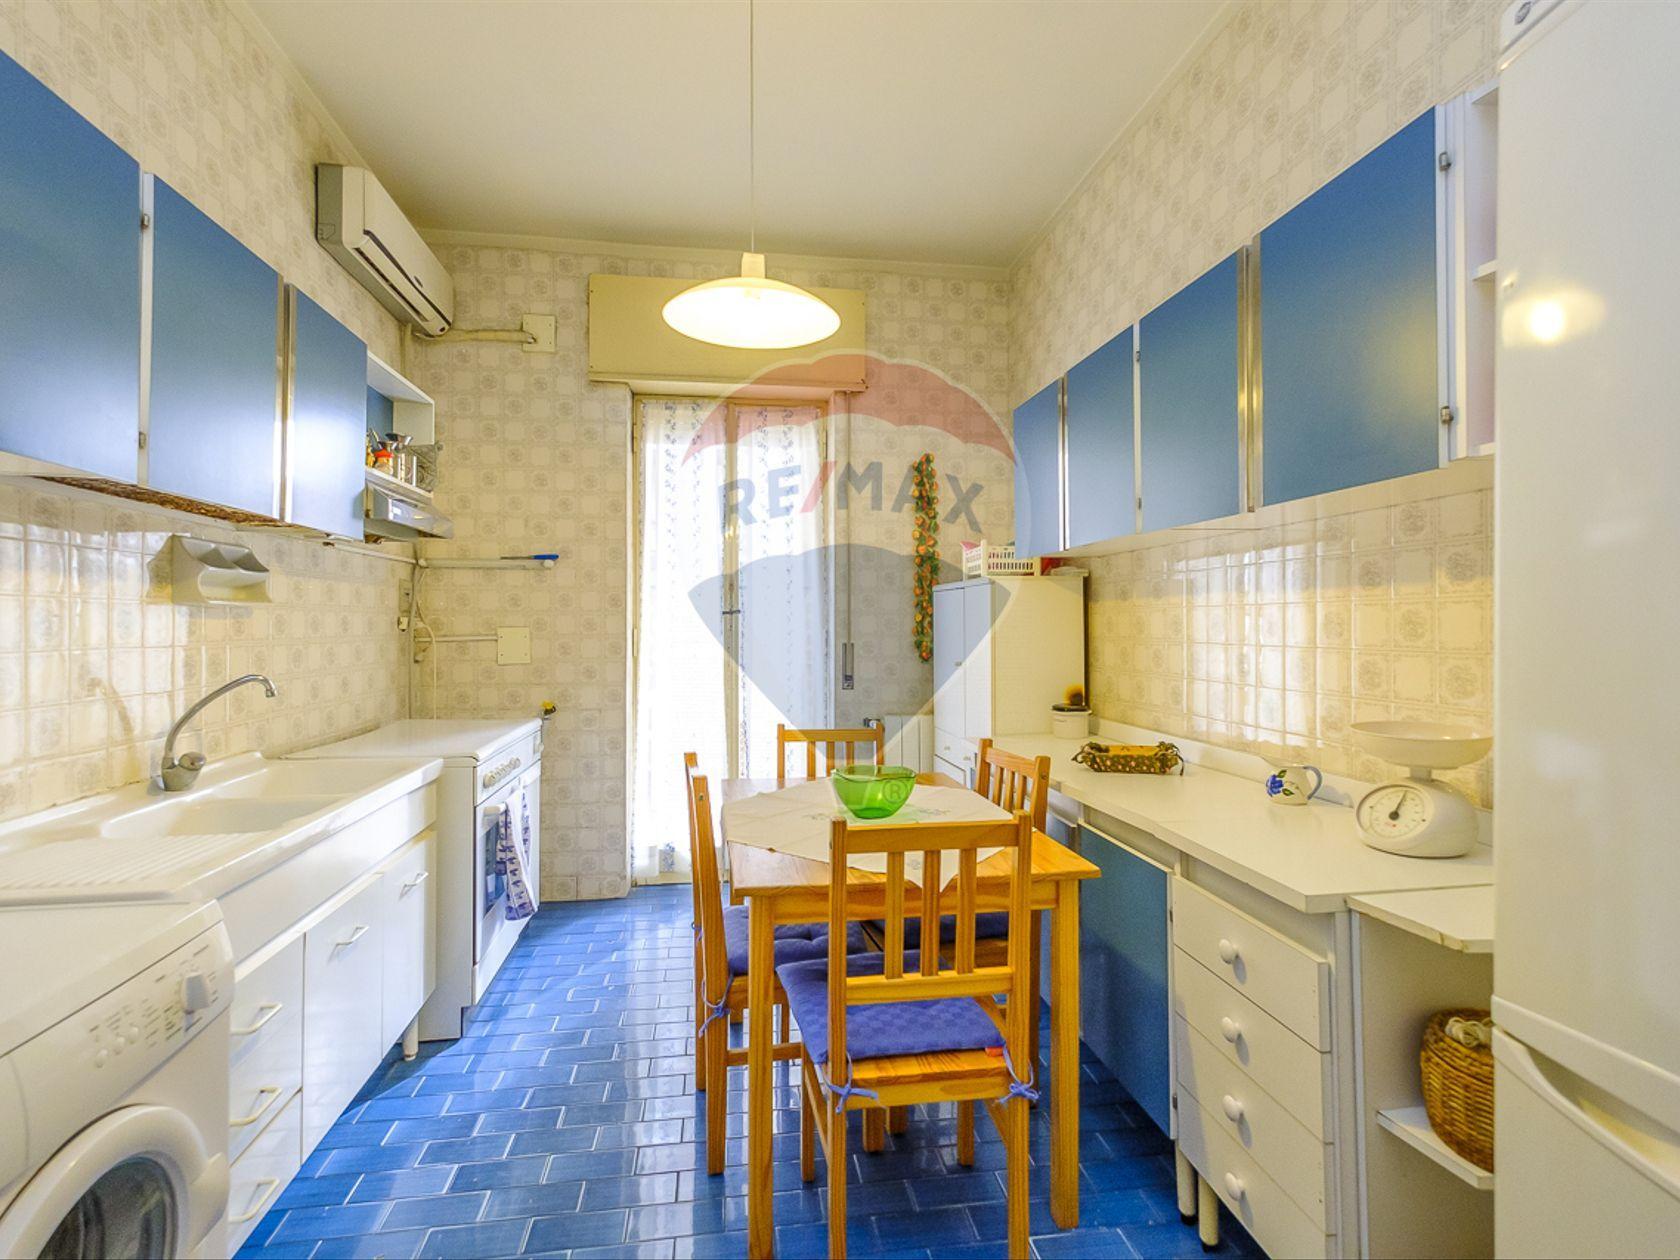 Appartamento Siracusa- Scala Greca S. Panagia Teracati Zecchino, Siracusa, SR Vendita - Foto 9